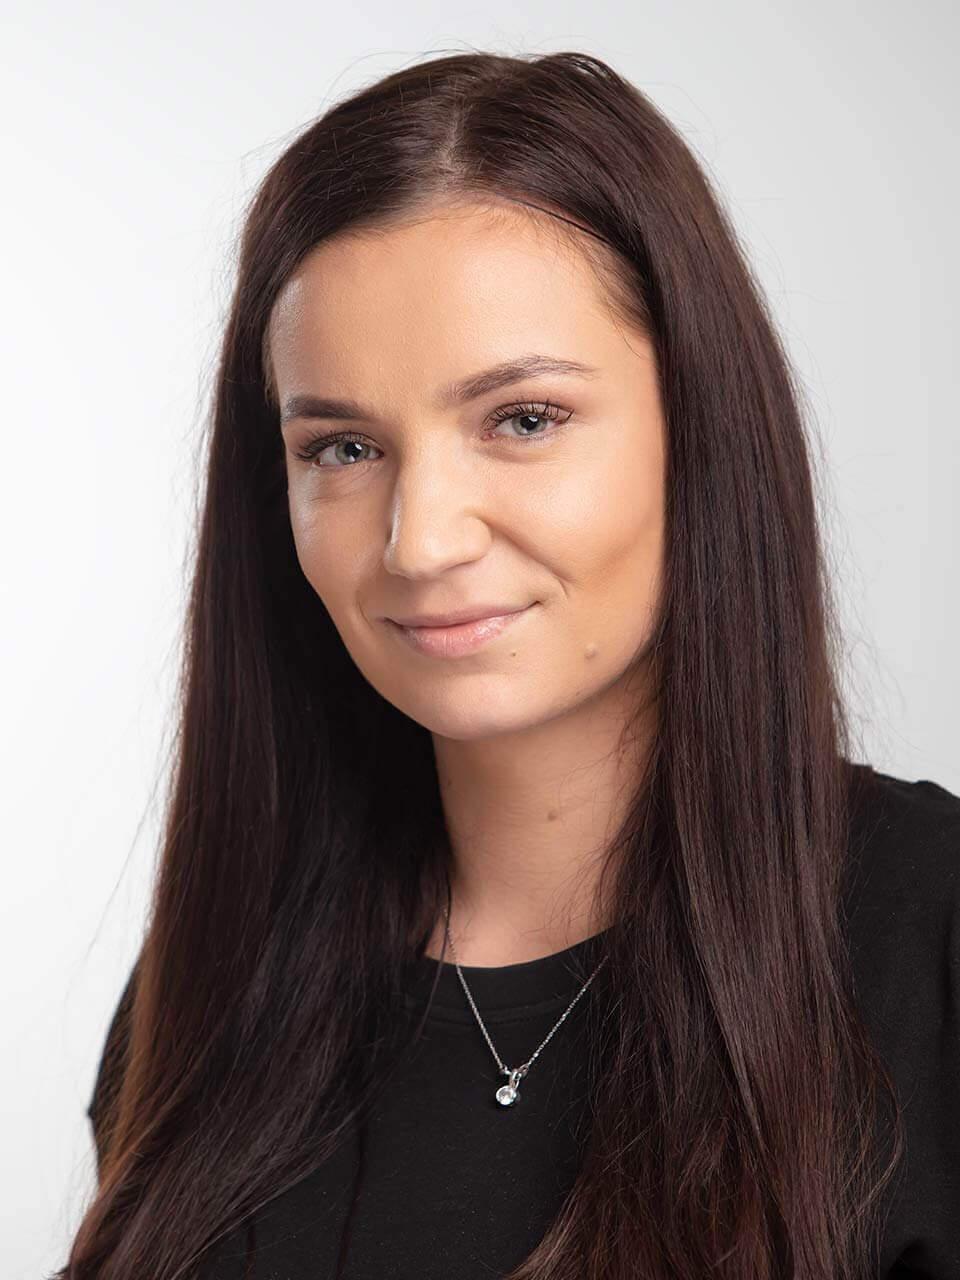 Bc. Veronika Frachová